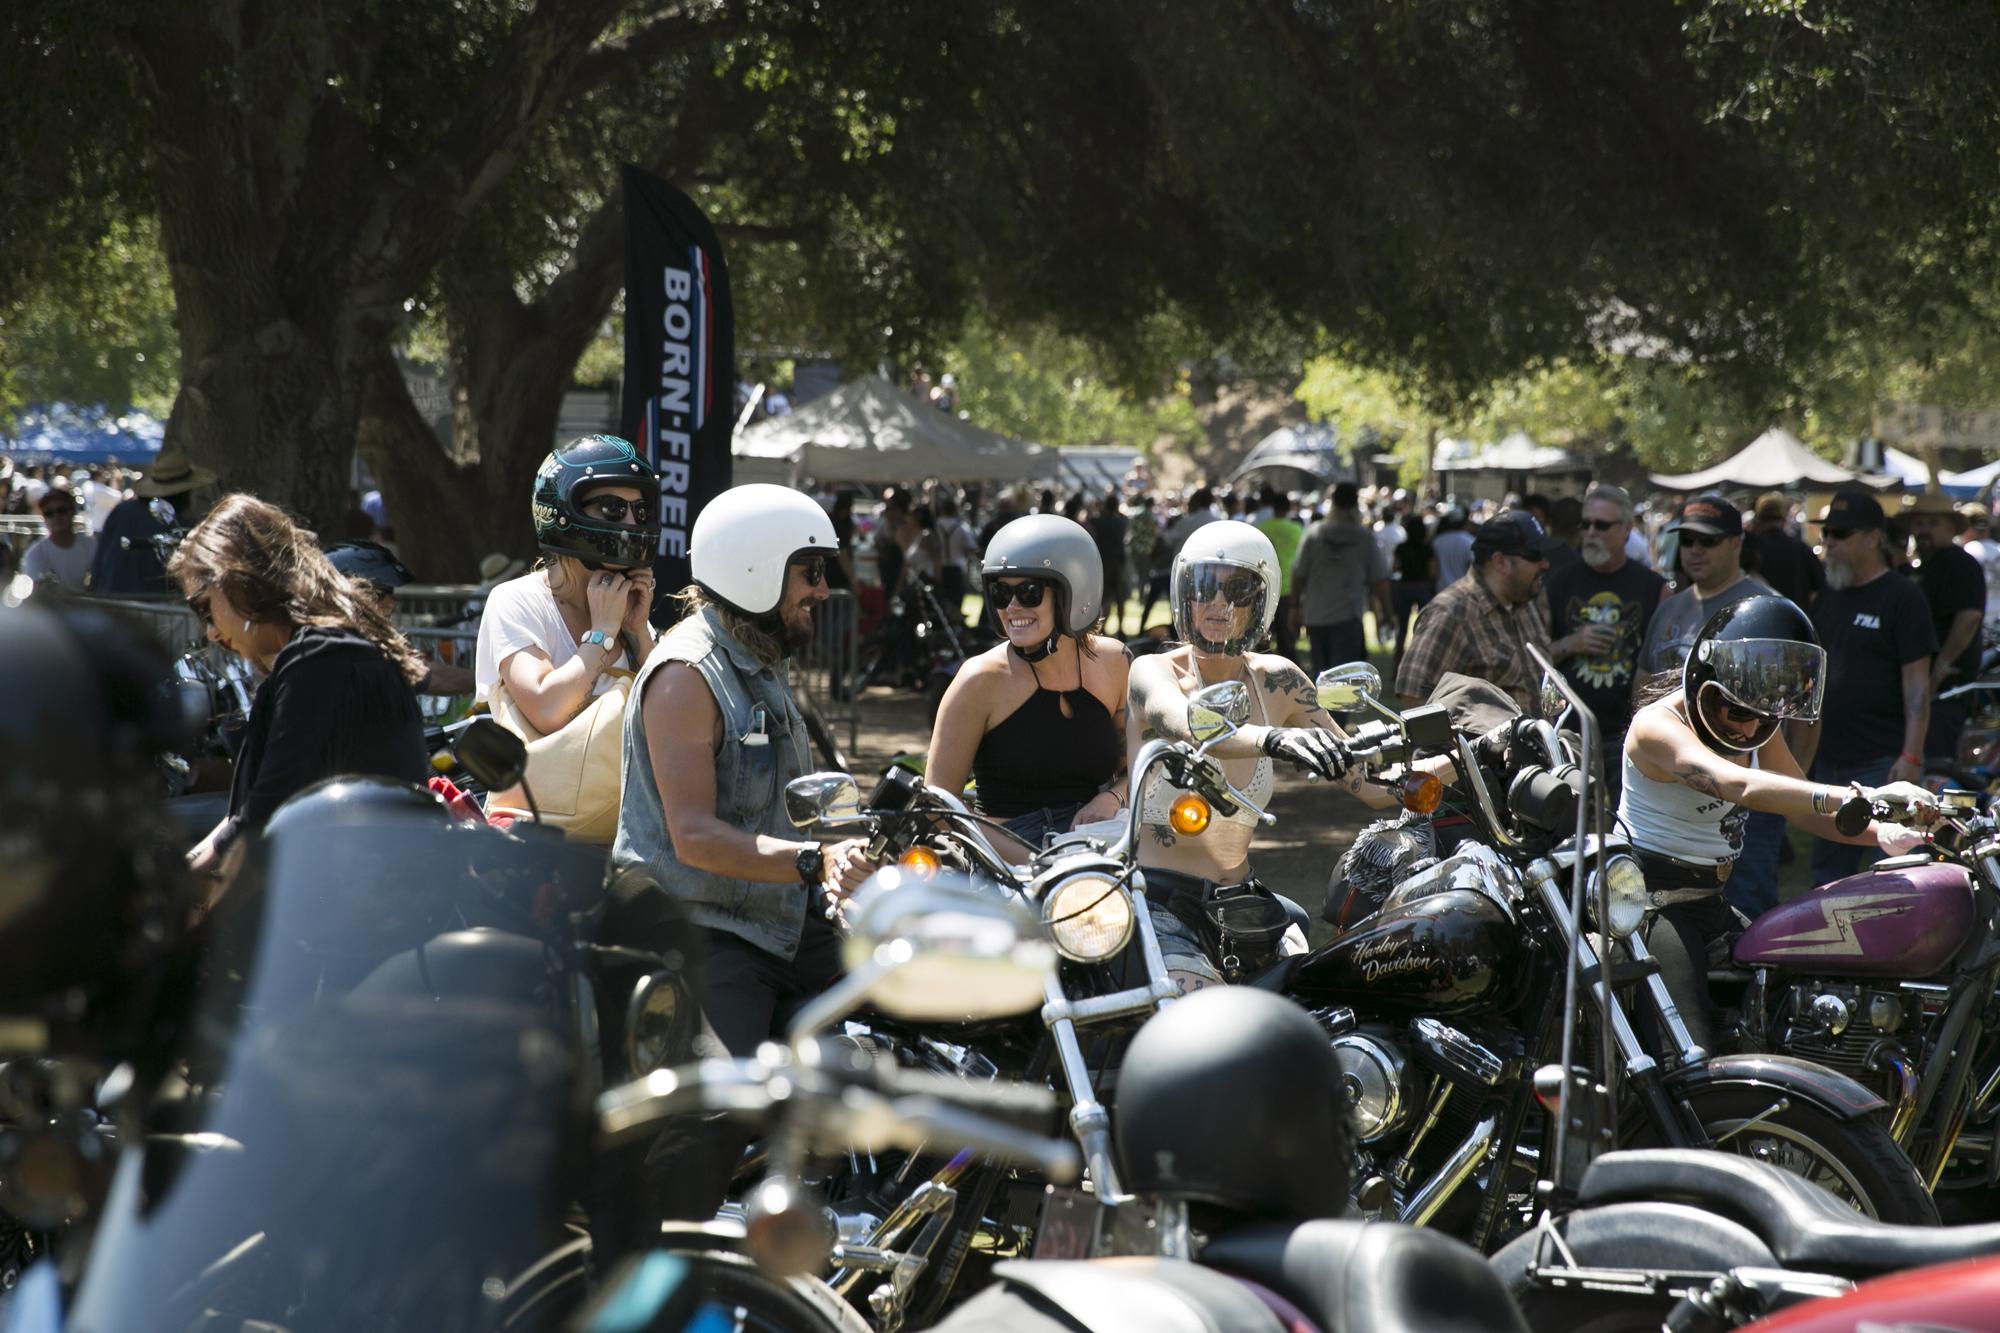 Born Free 8 Motorcycle Show-112.jpg